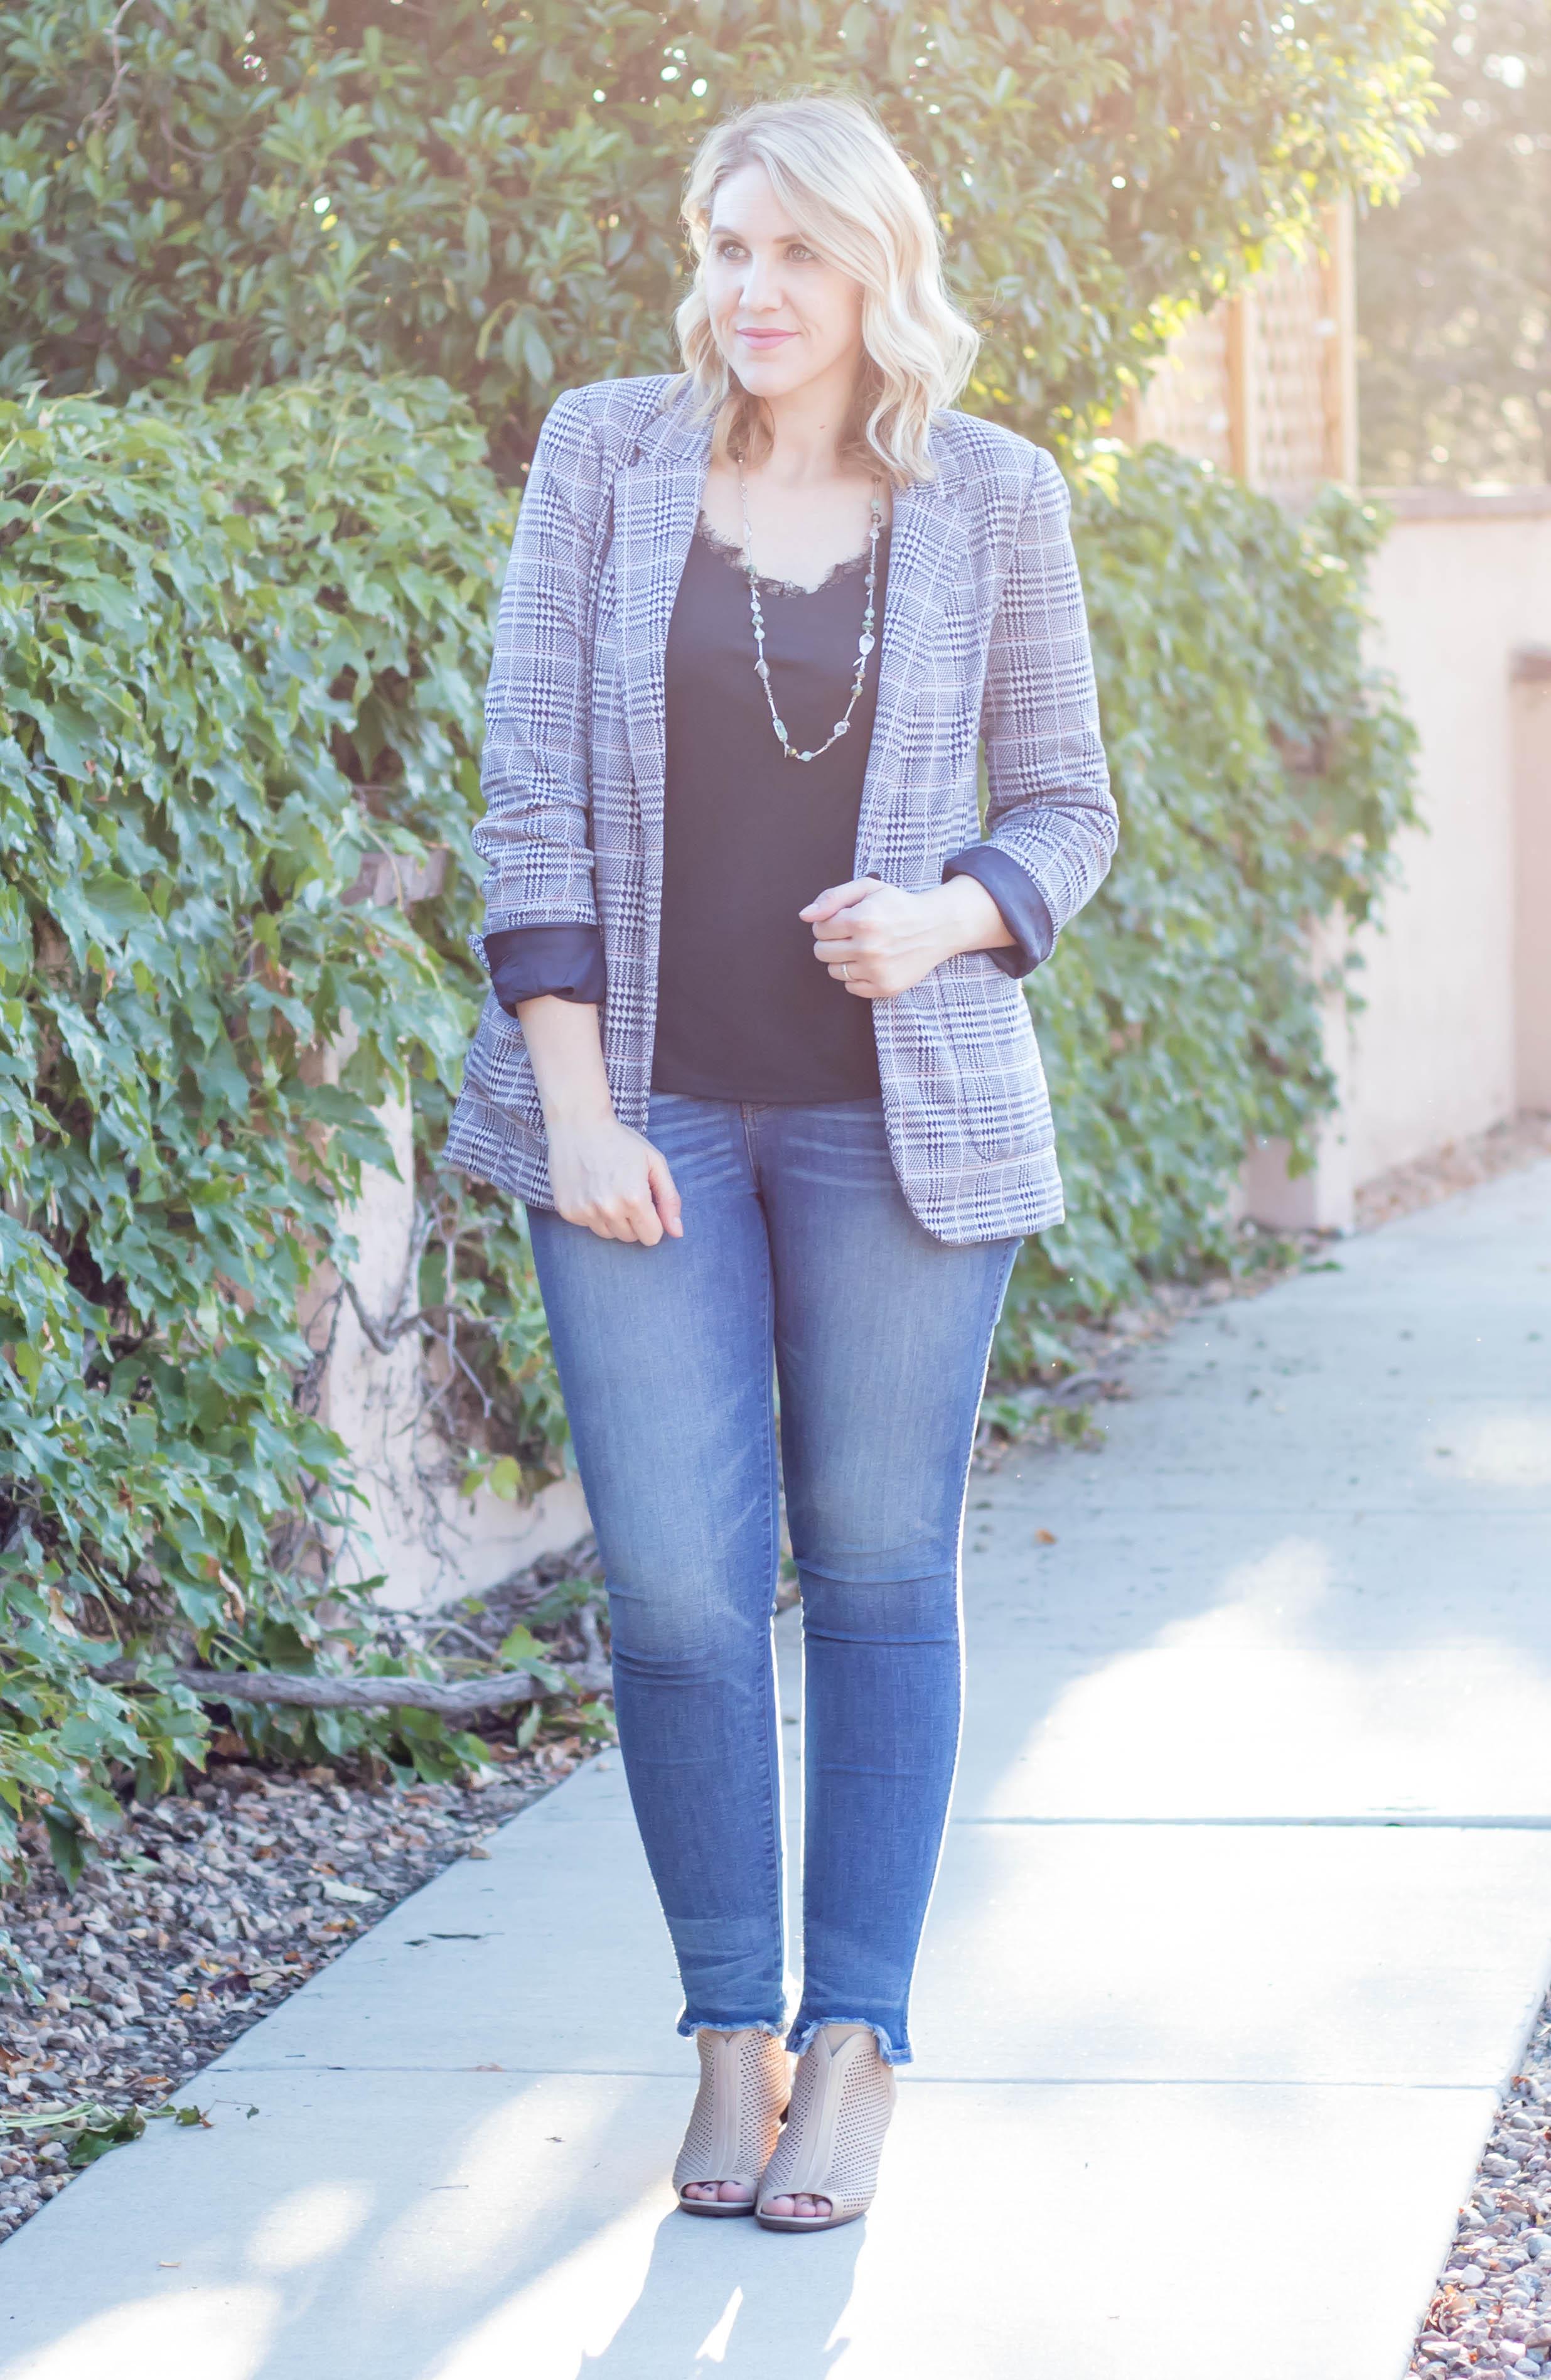 plaid blazer for fall #denim #falloutift #jeansoutfit #blazer